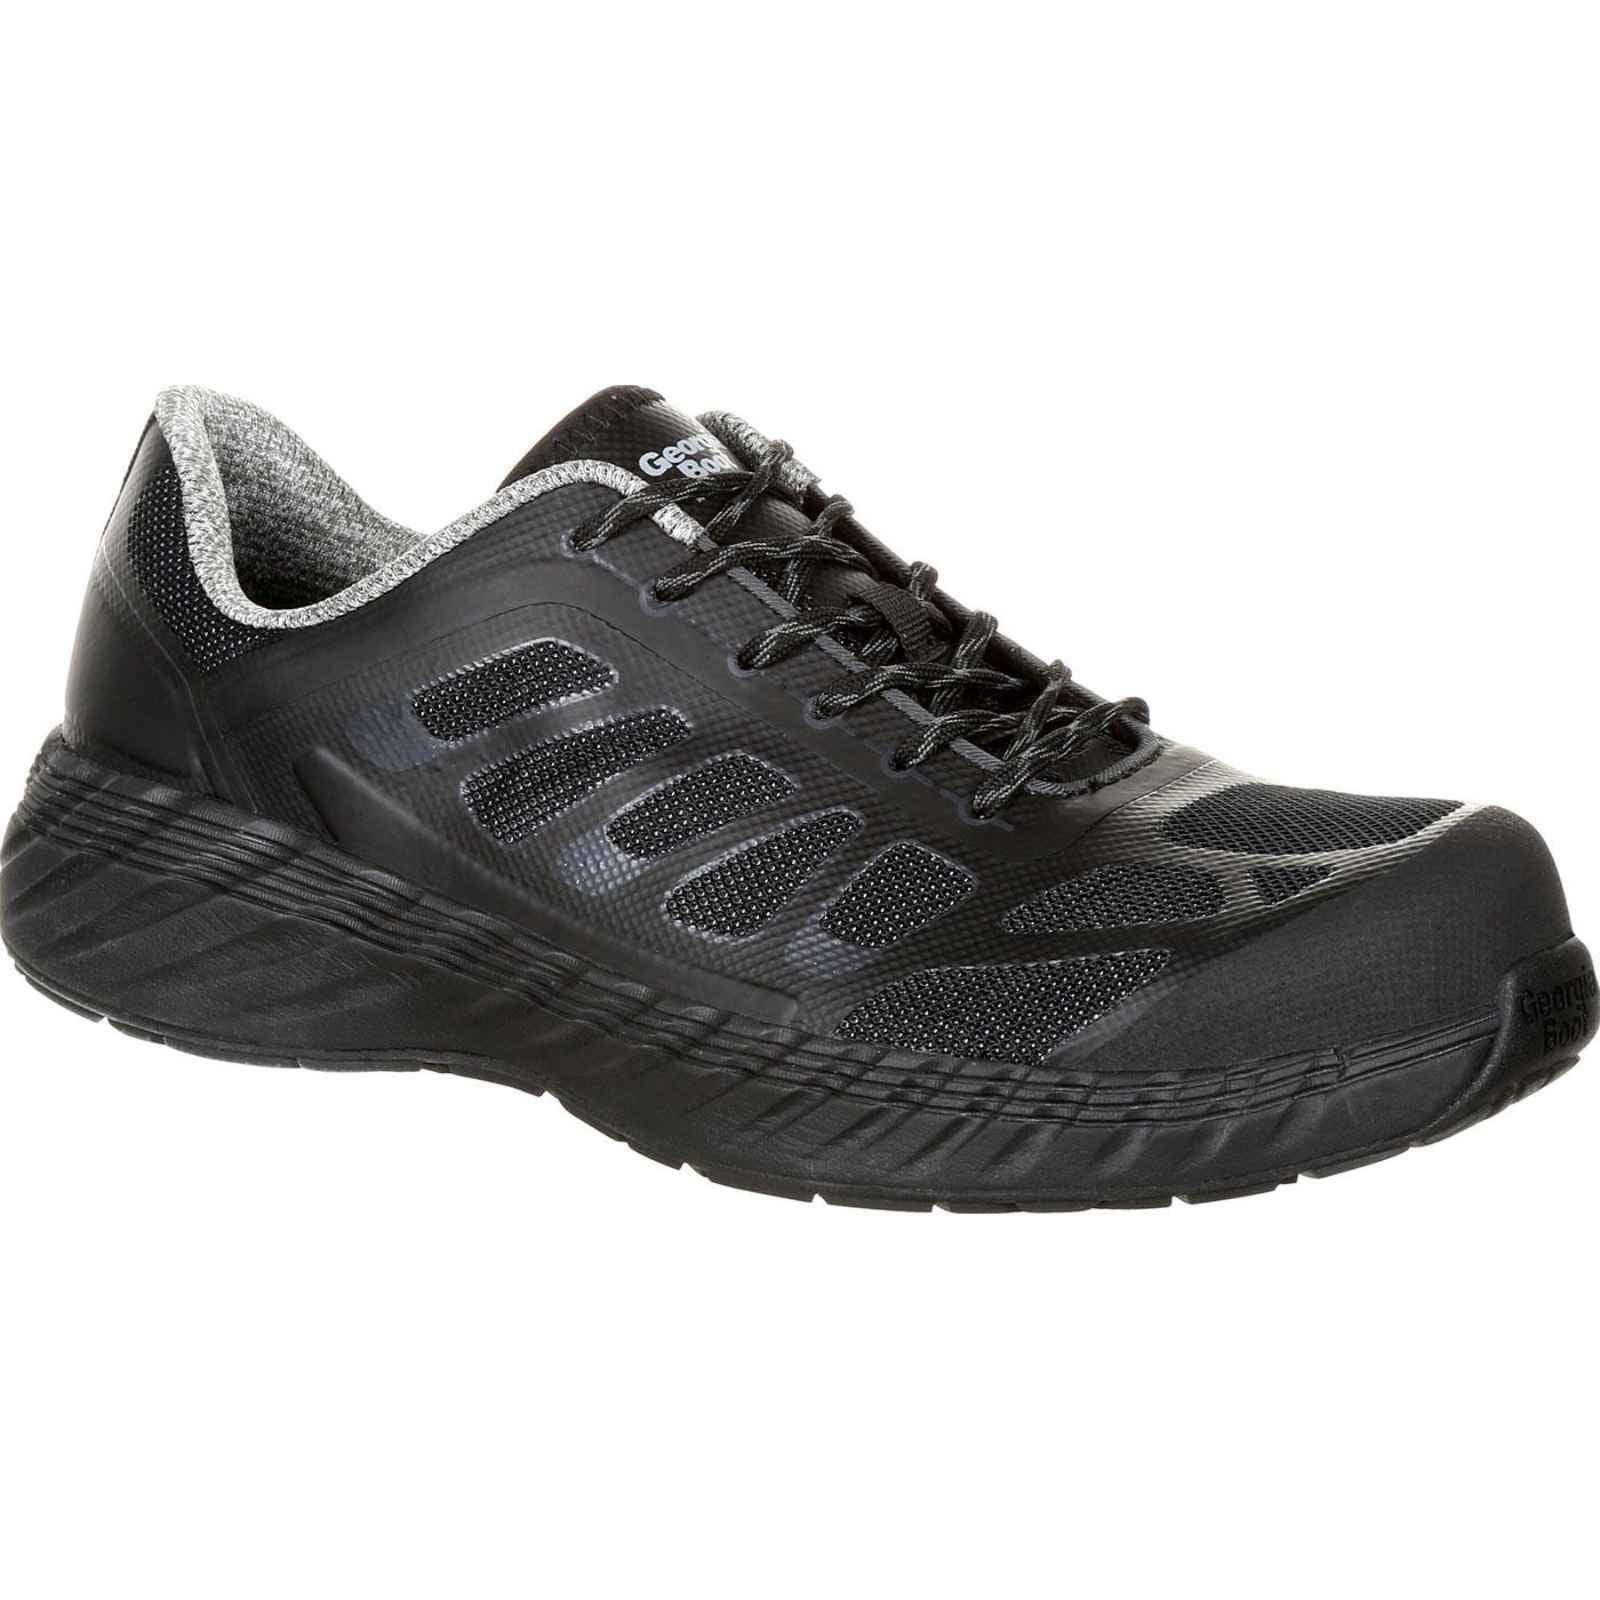 Georgia Boot Men's Black ReFLX Composite Toe Athletic Work Shoe GB00220 by Georgia